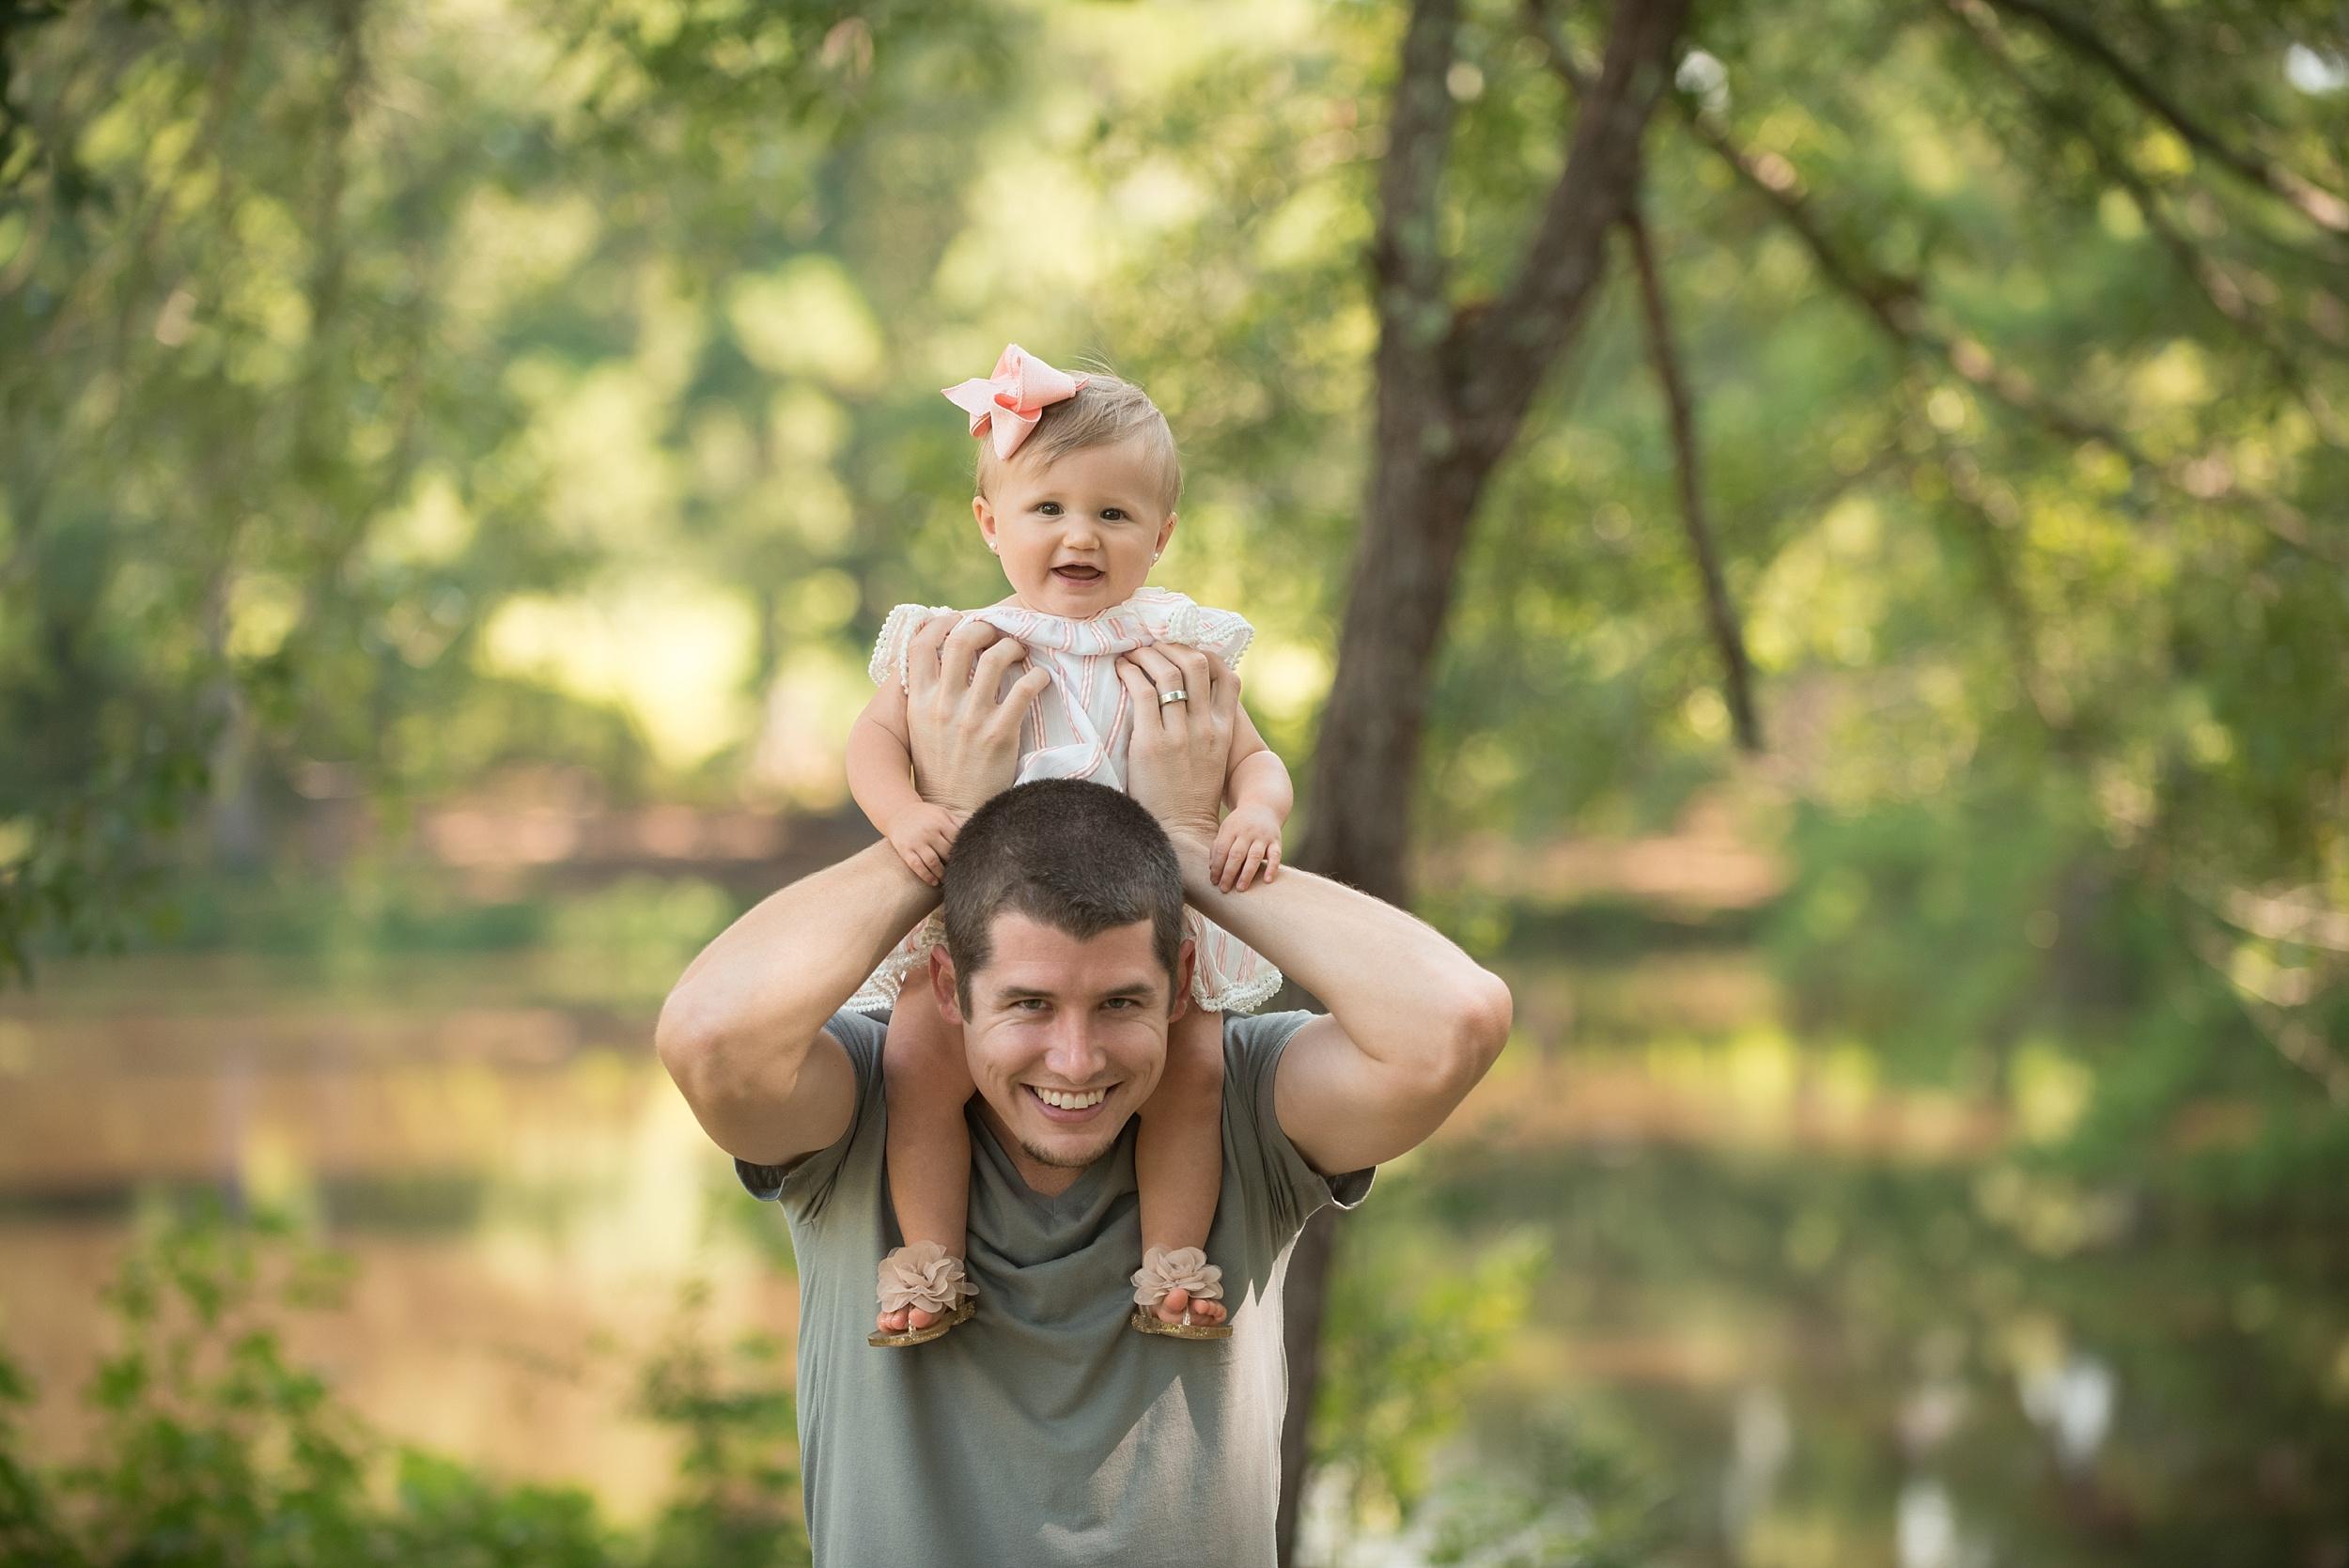 toddler girl rides on her dad's shoulders